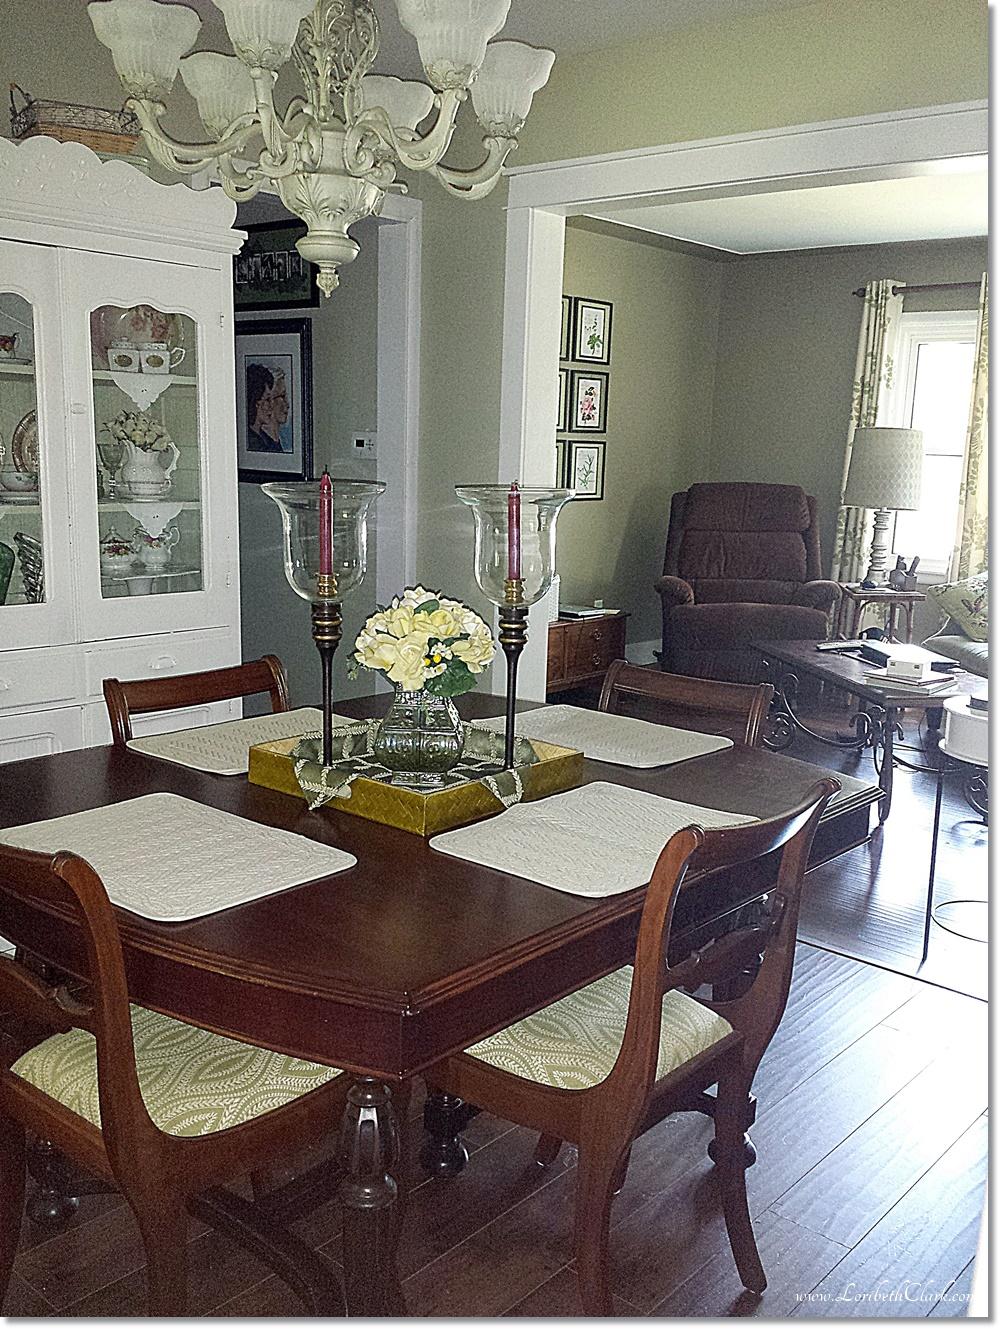 My Haunted Dining Room Table Loribeth Clark